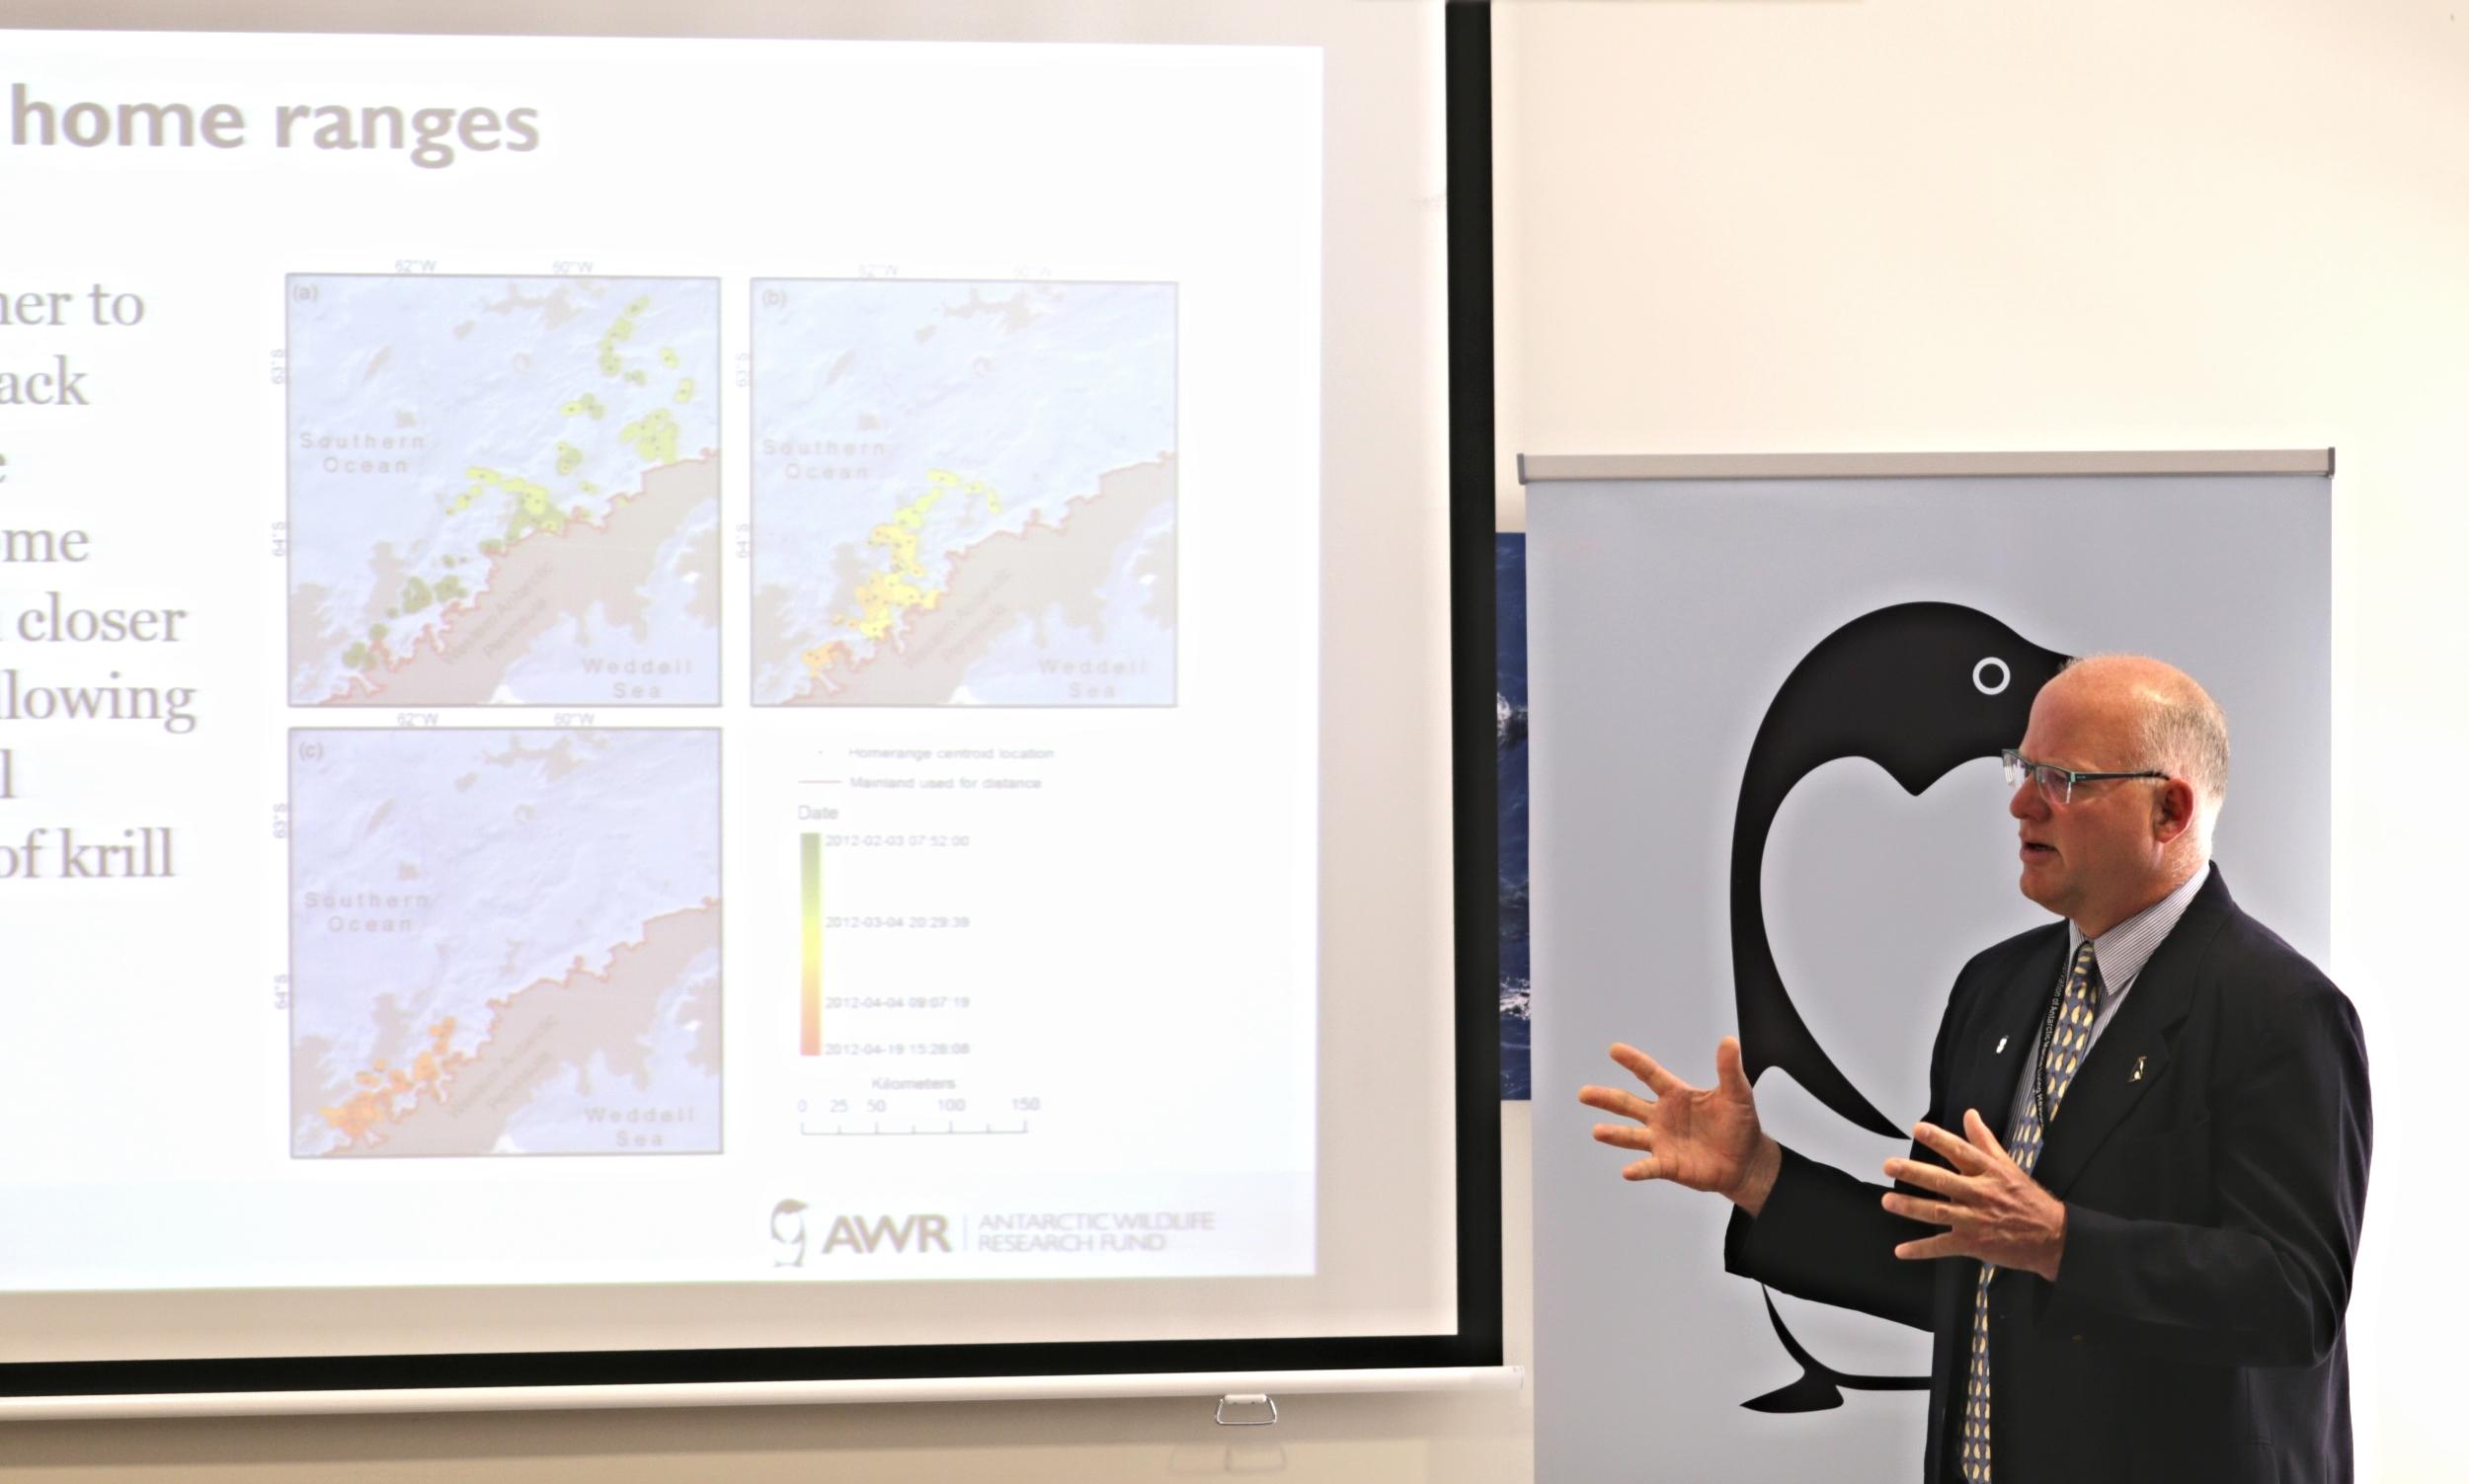 AWR's scientific advisor Rodolfo Werner presenting the project on behalf of Ari Friedlander. Photo: Bob Zuur, WWF